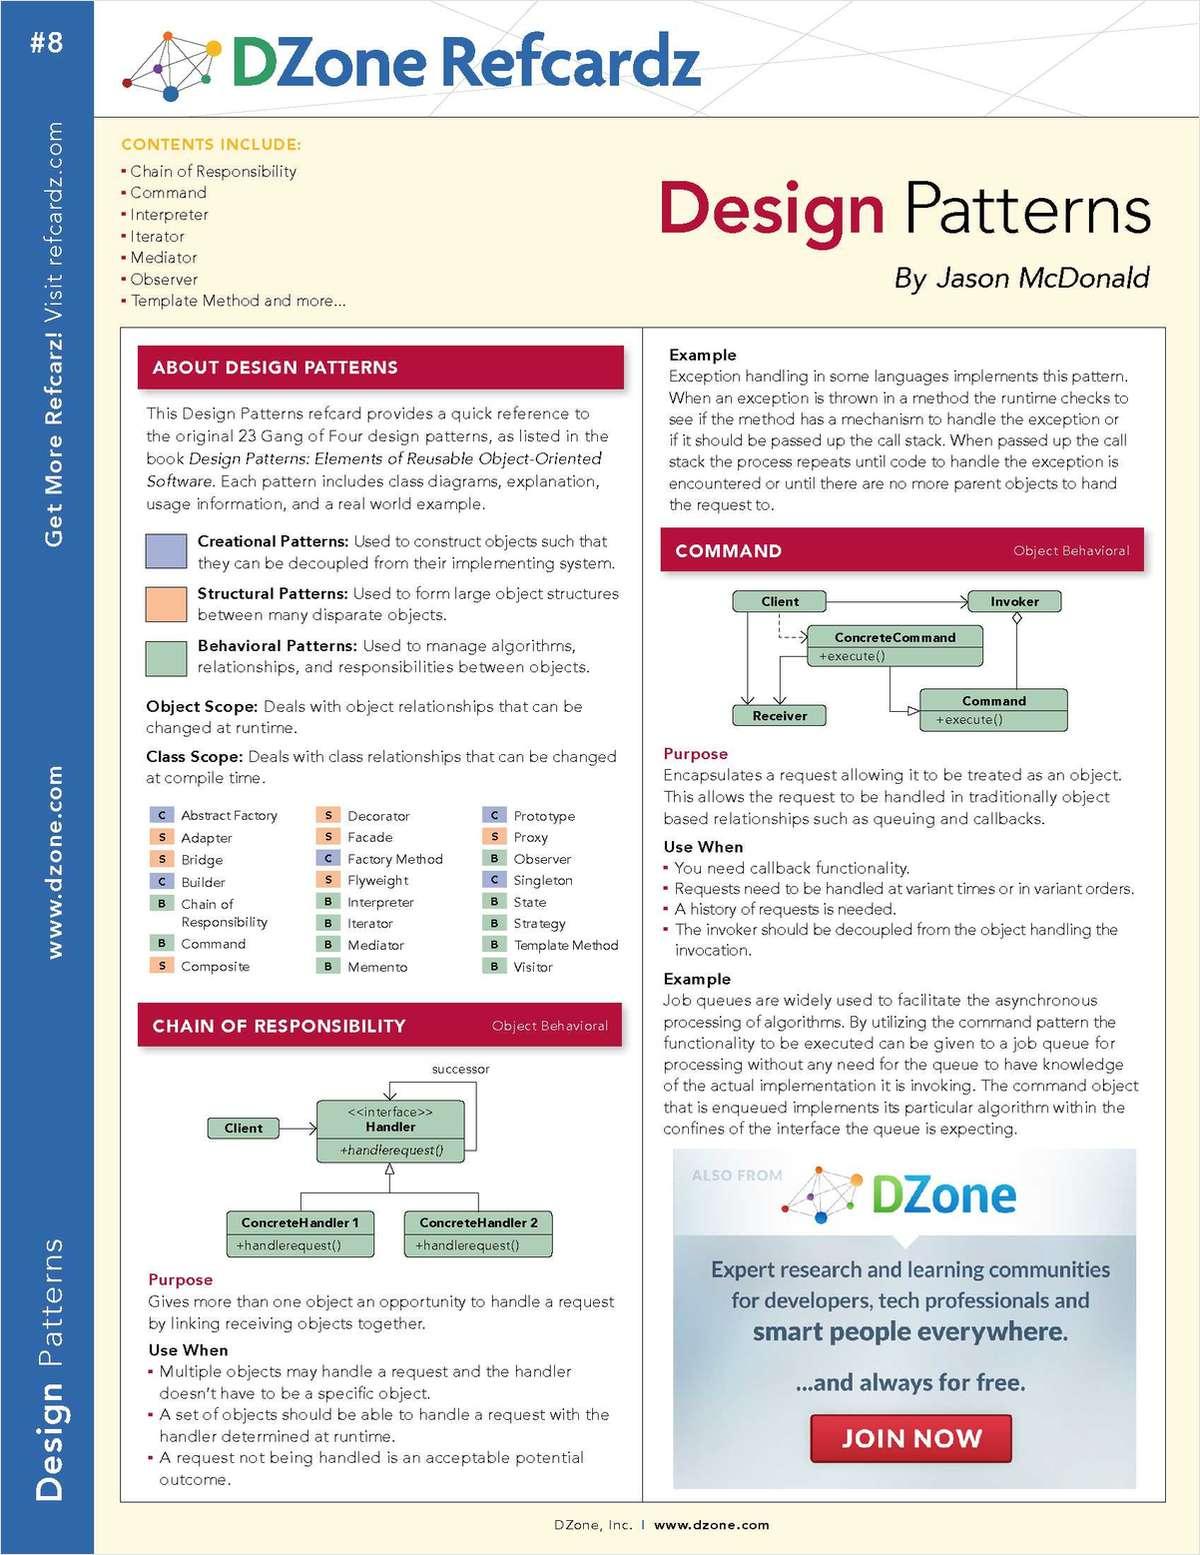 The Essential Design Patterns Cheat Sheet